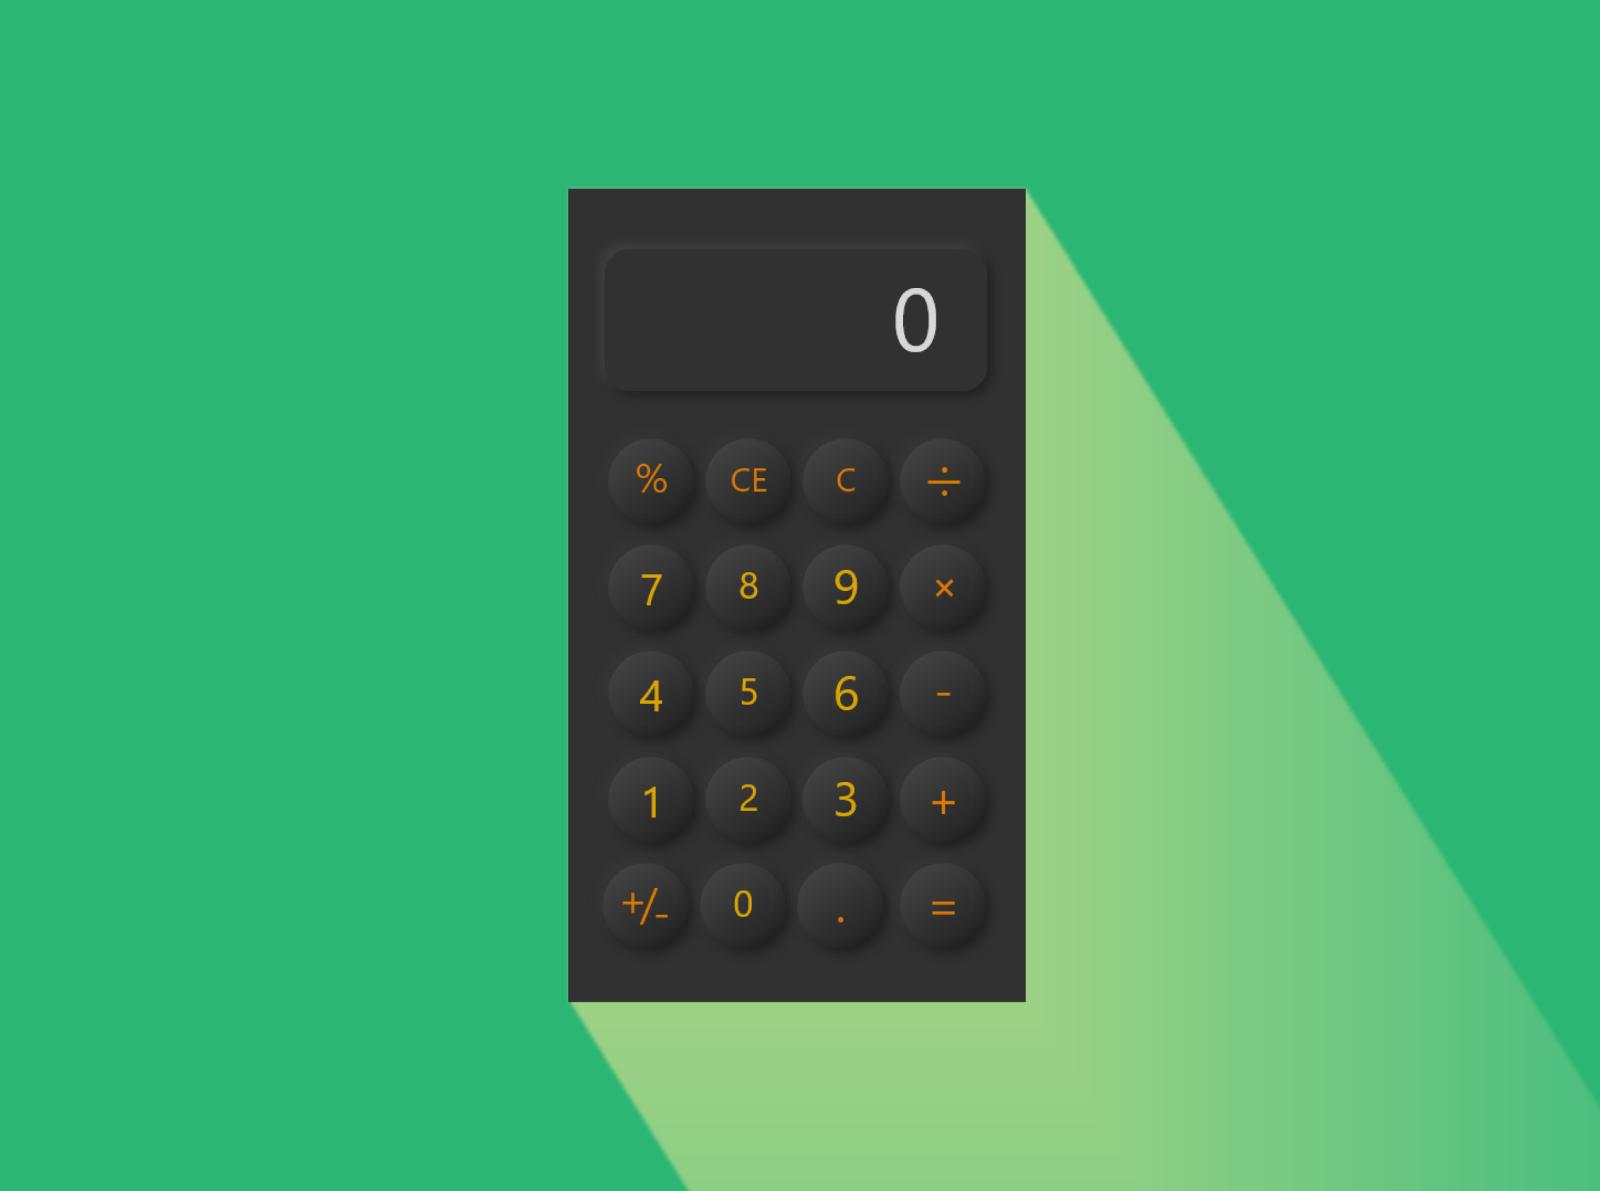 Design challenge - Calculator